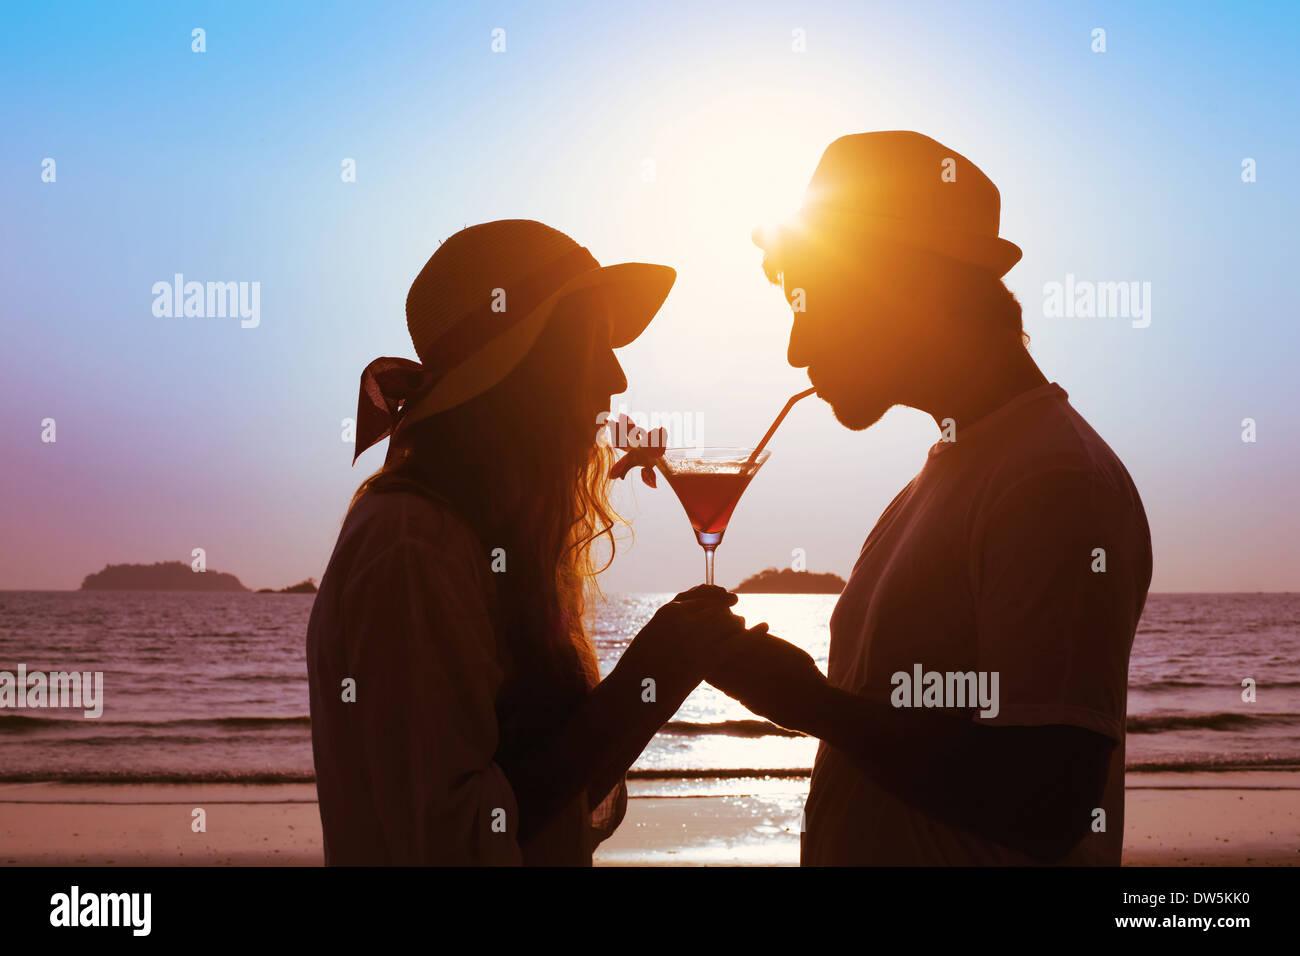 Compartir el placer, pareja de beber cócteles en la playa Imagen De Stock